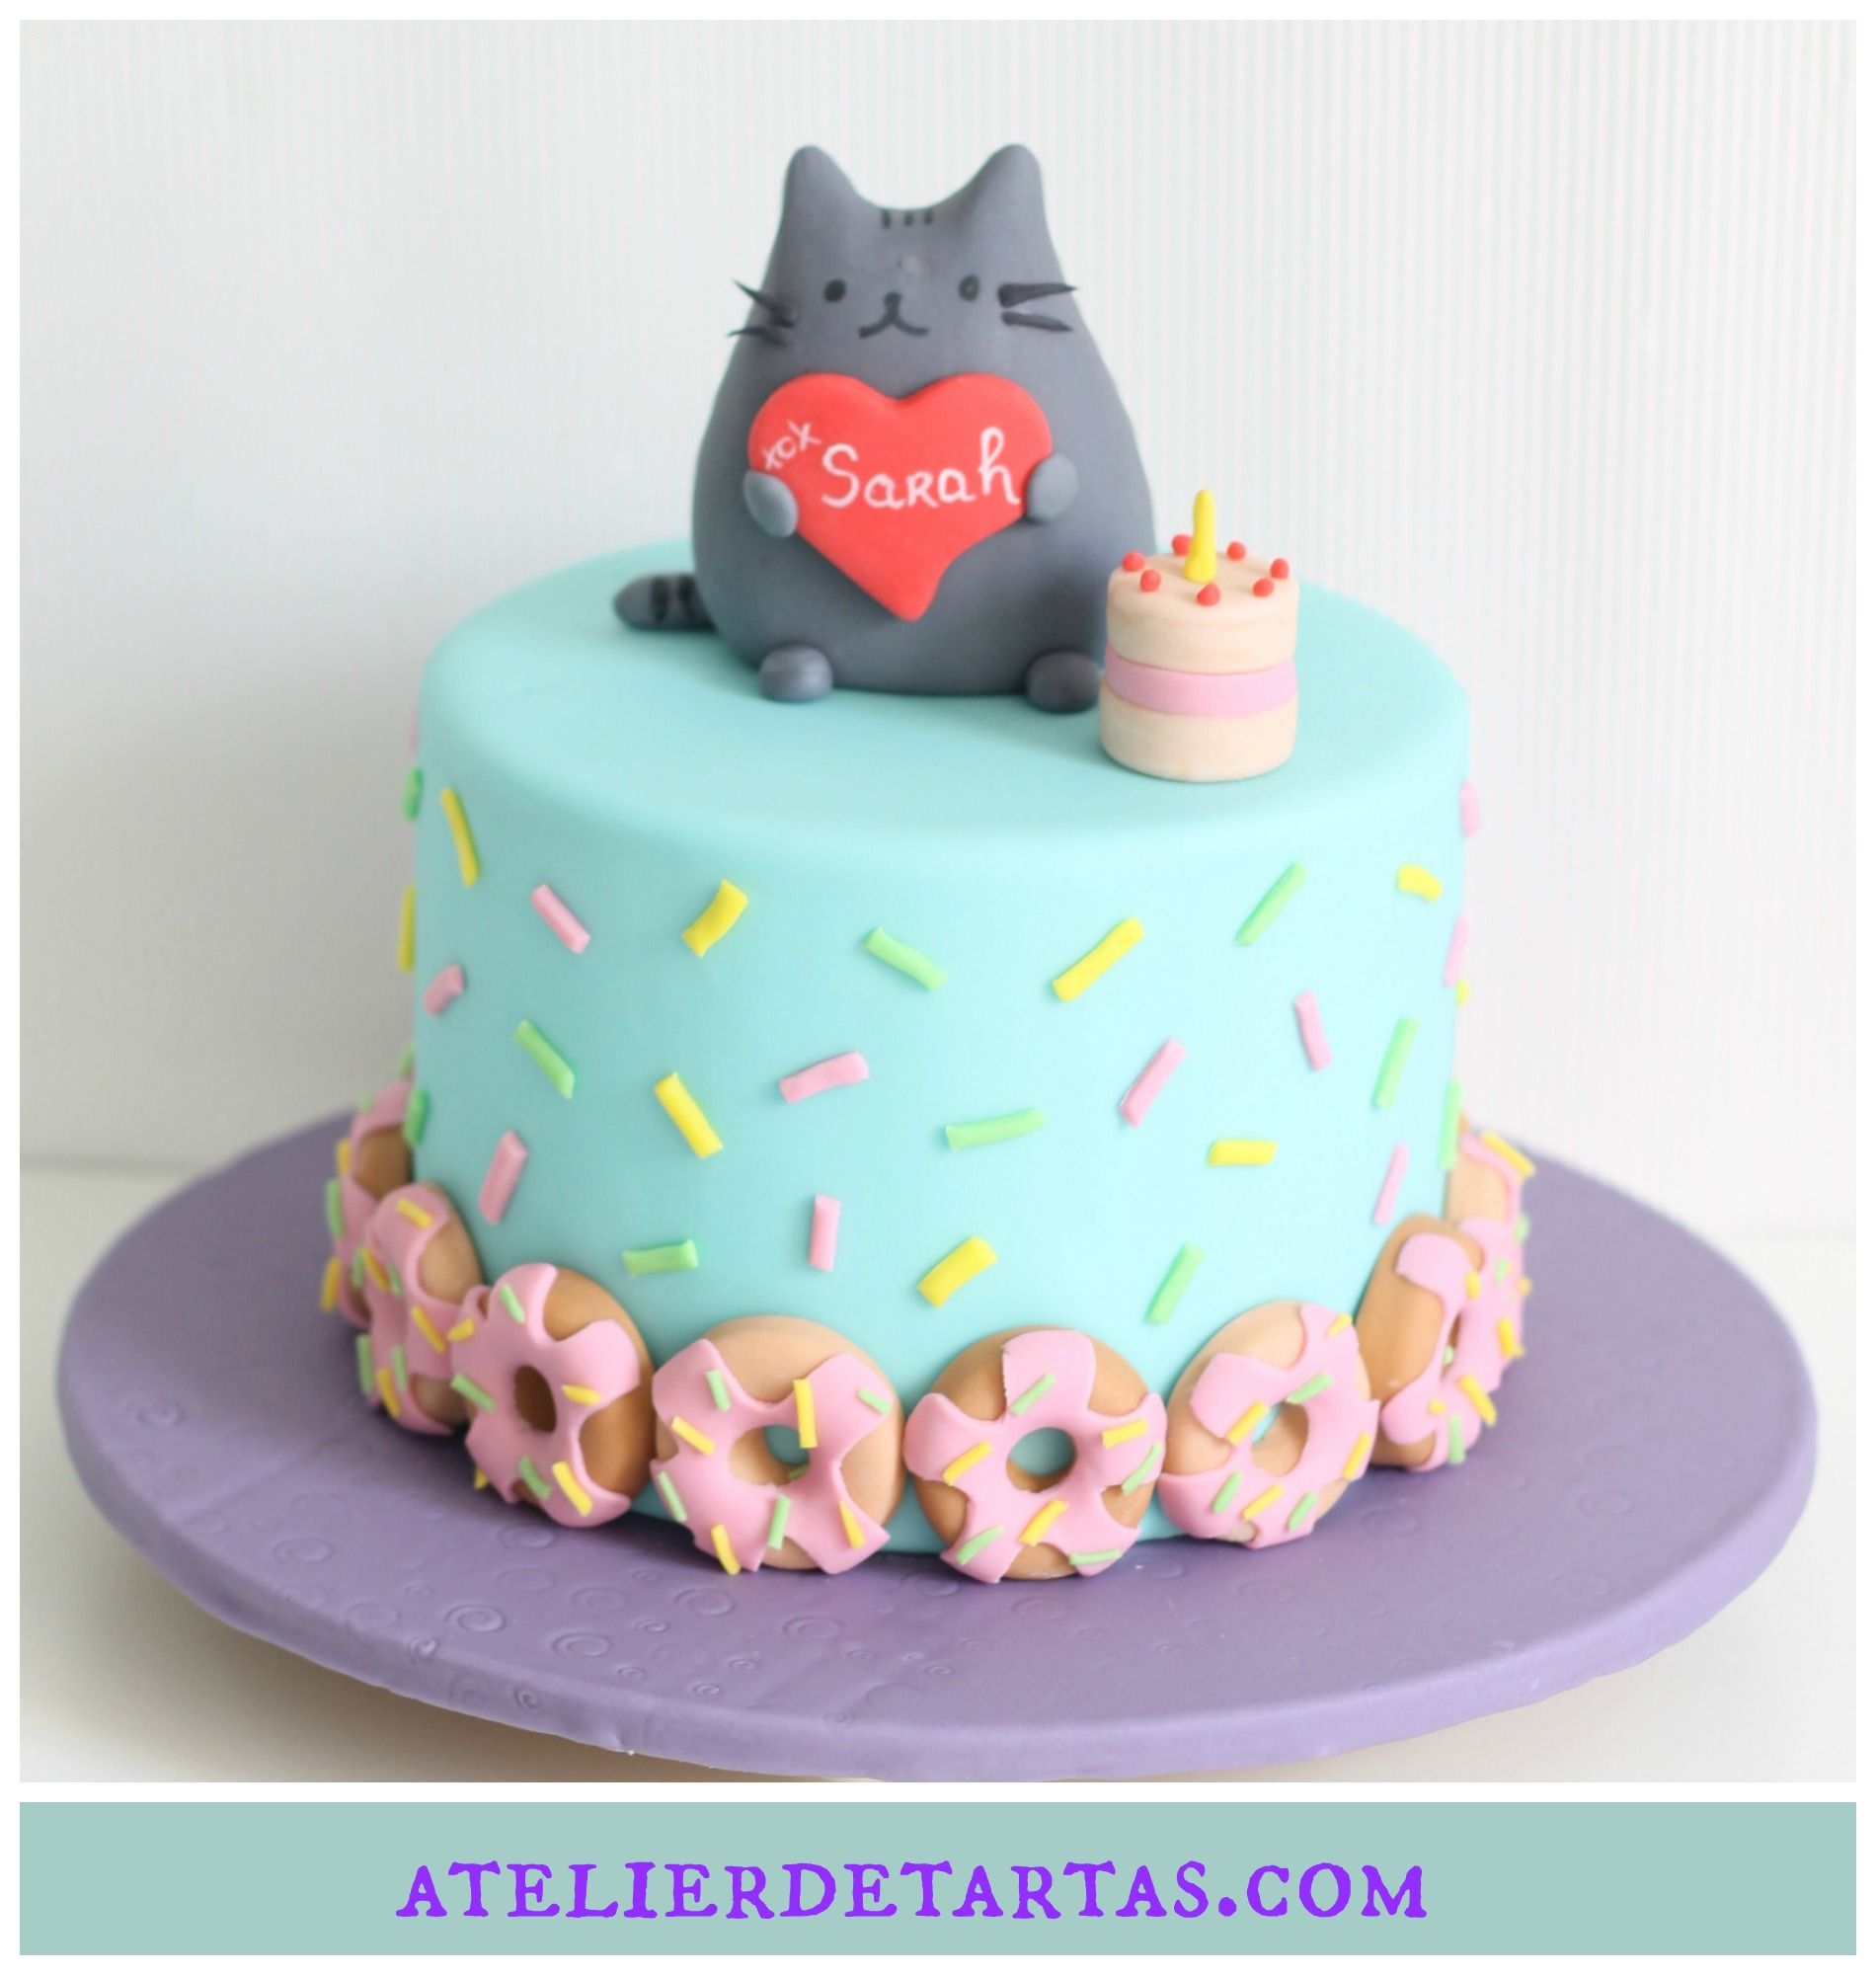 Pusheen Cat Fondant Cake by Atelier de Tartas Pusheen cat mallorca